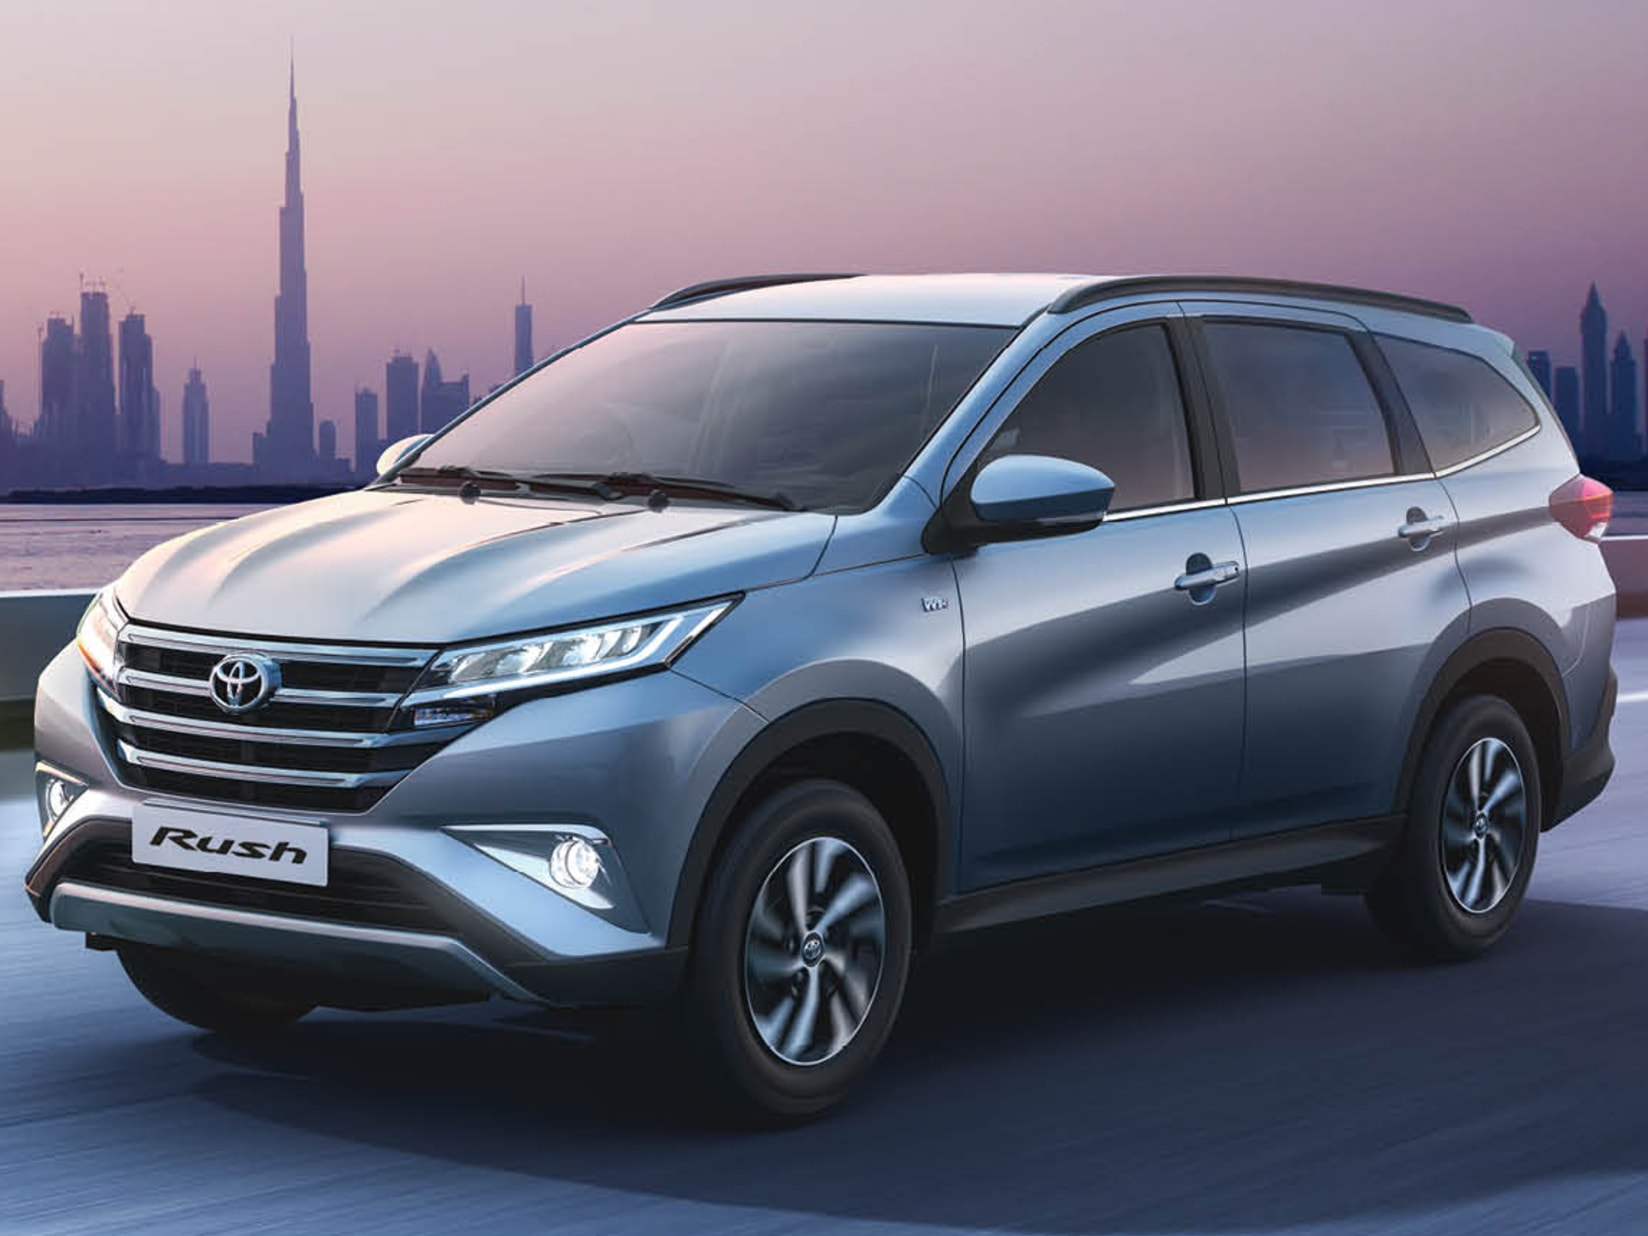 Kelebihan Harga Mobil Rush 2019 Spesifikasi